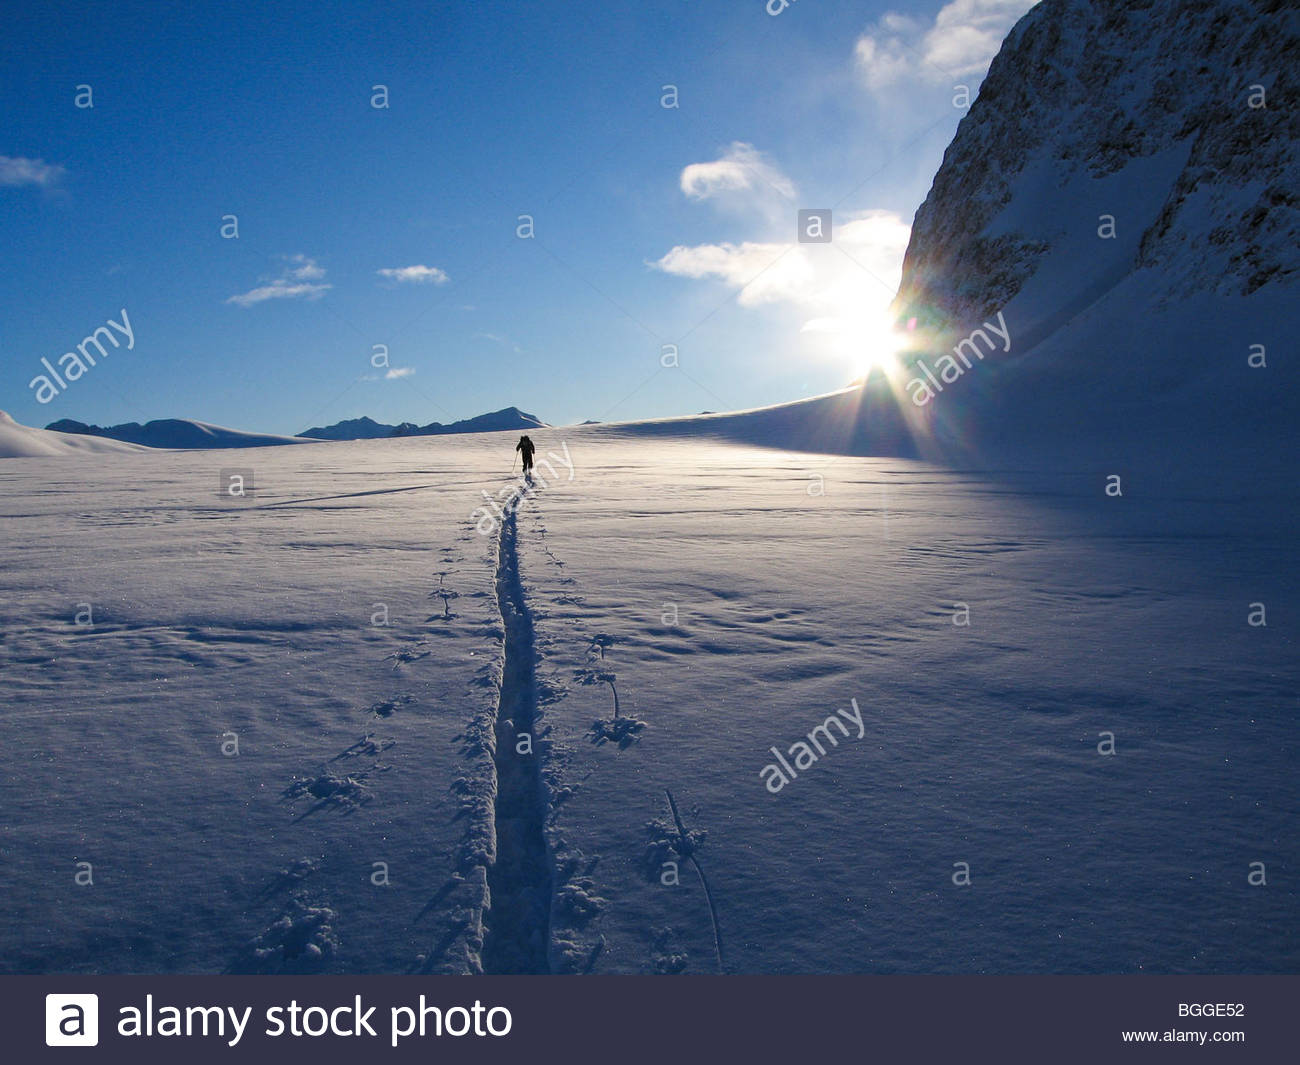 Alaska, Chugach State Park, Eklutna Glacier. A climber crosses the Eklutna Glacier to approach Peril Peak. - Stock Image